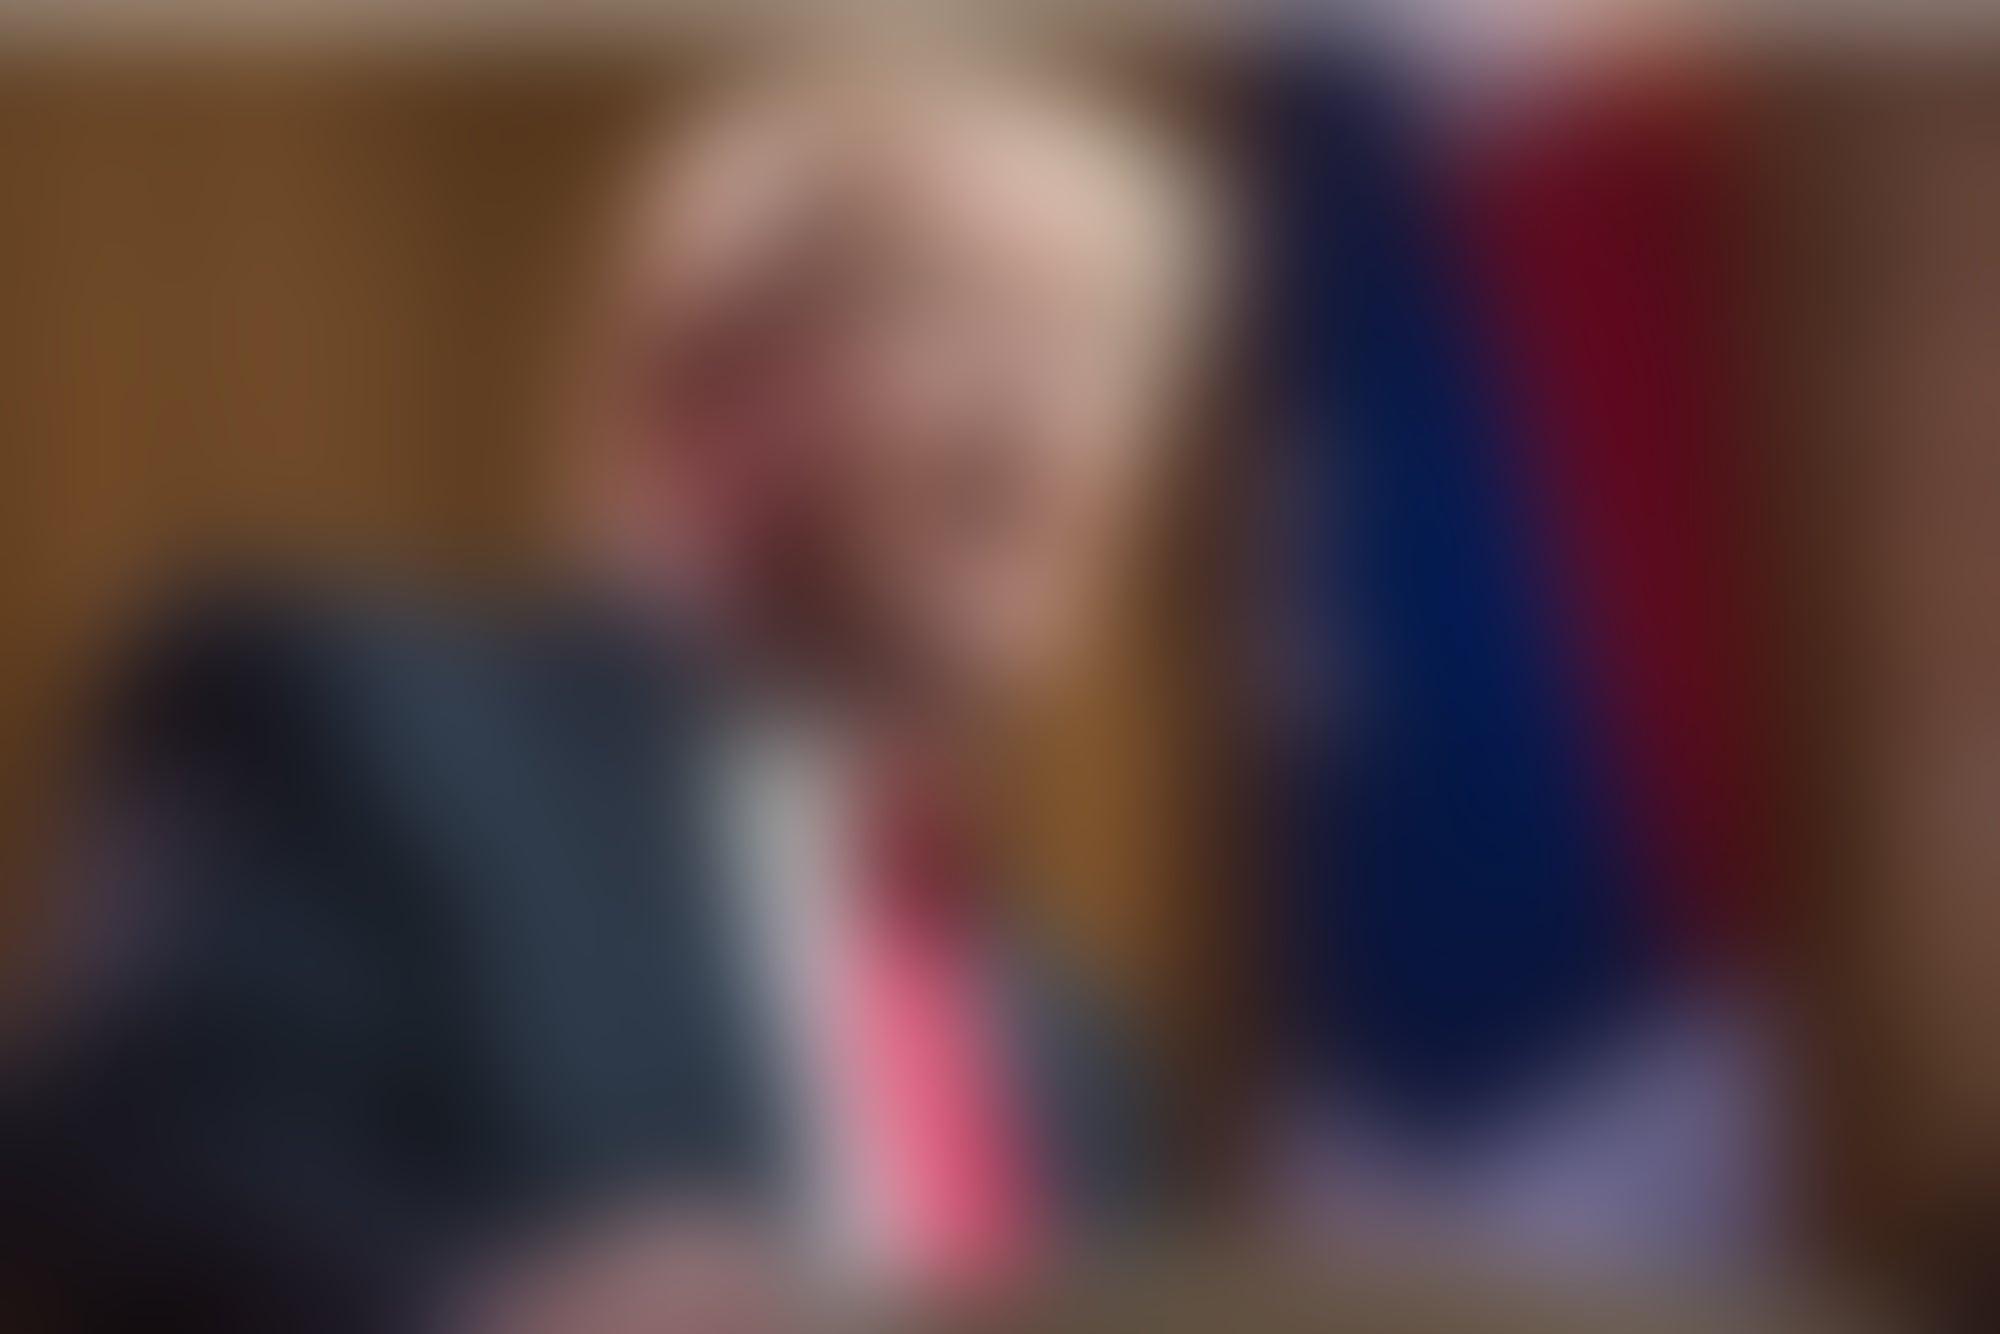 What's Behind the Trump Juggernaut